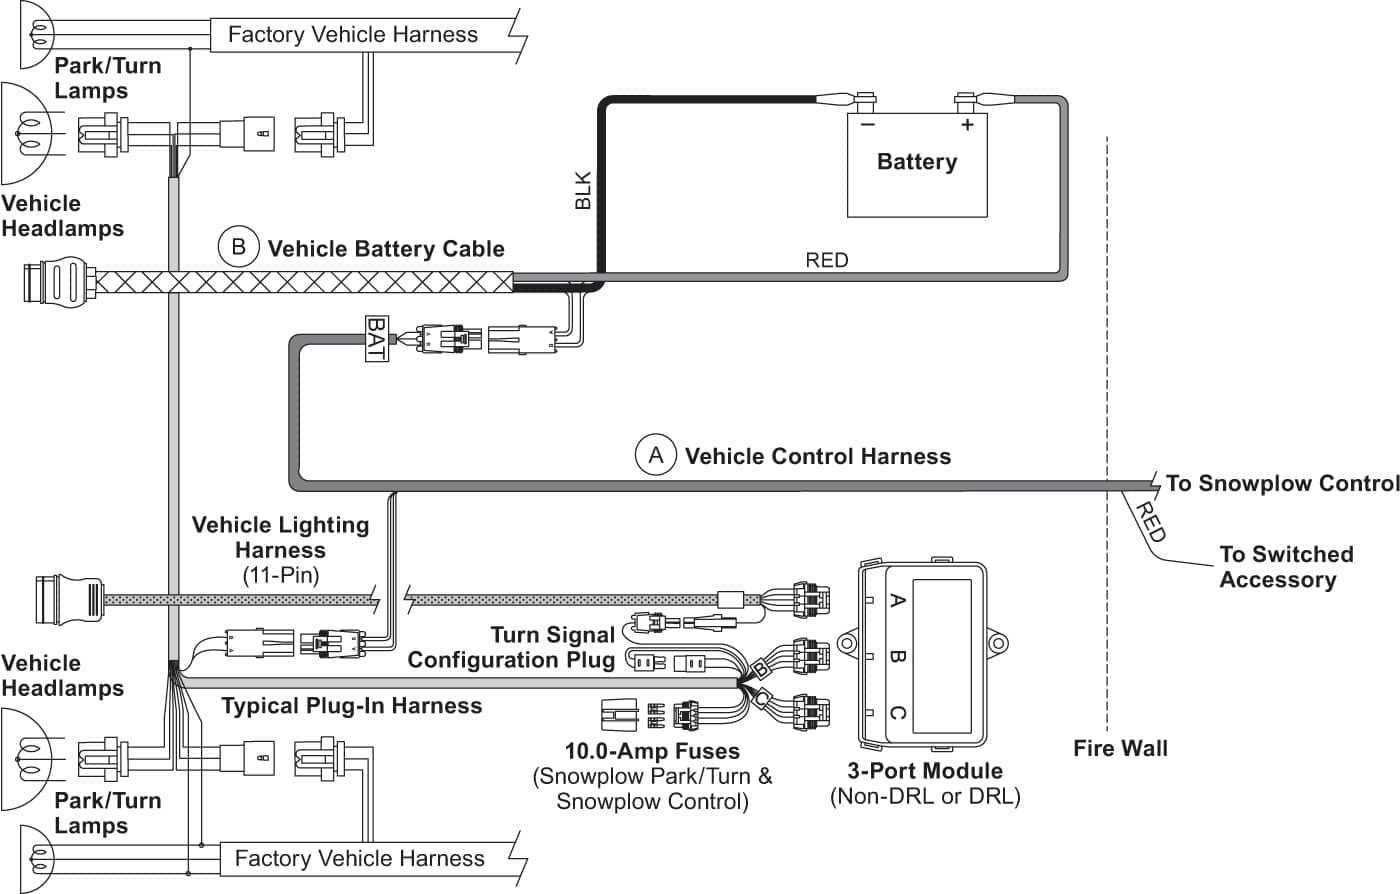 Western Unimount Plow Wiring Harness - Data Wiring Diagram Site - Western Unimount Plow Wiring Diagram